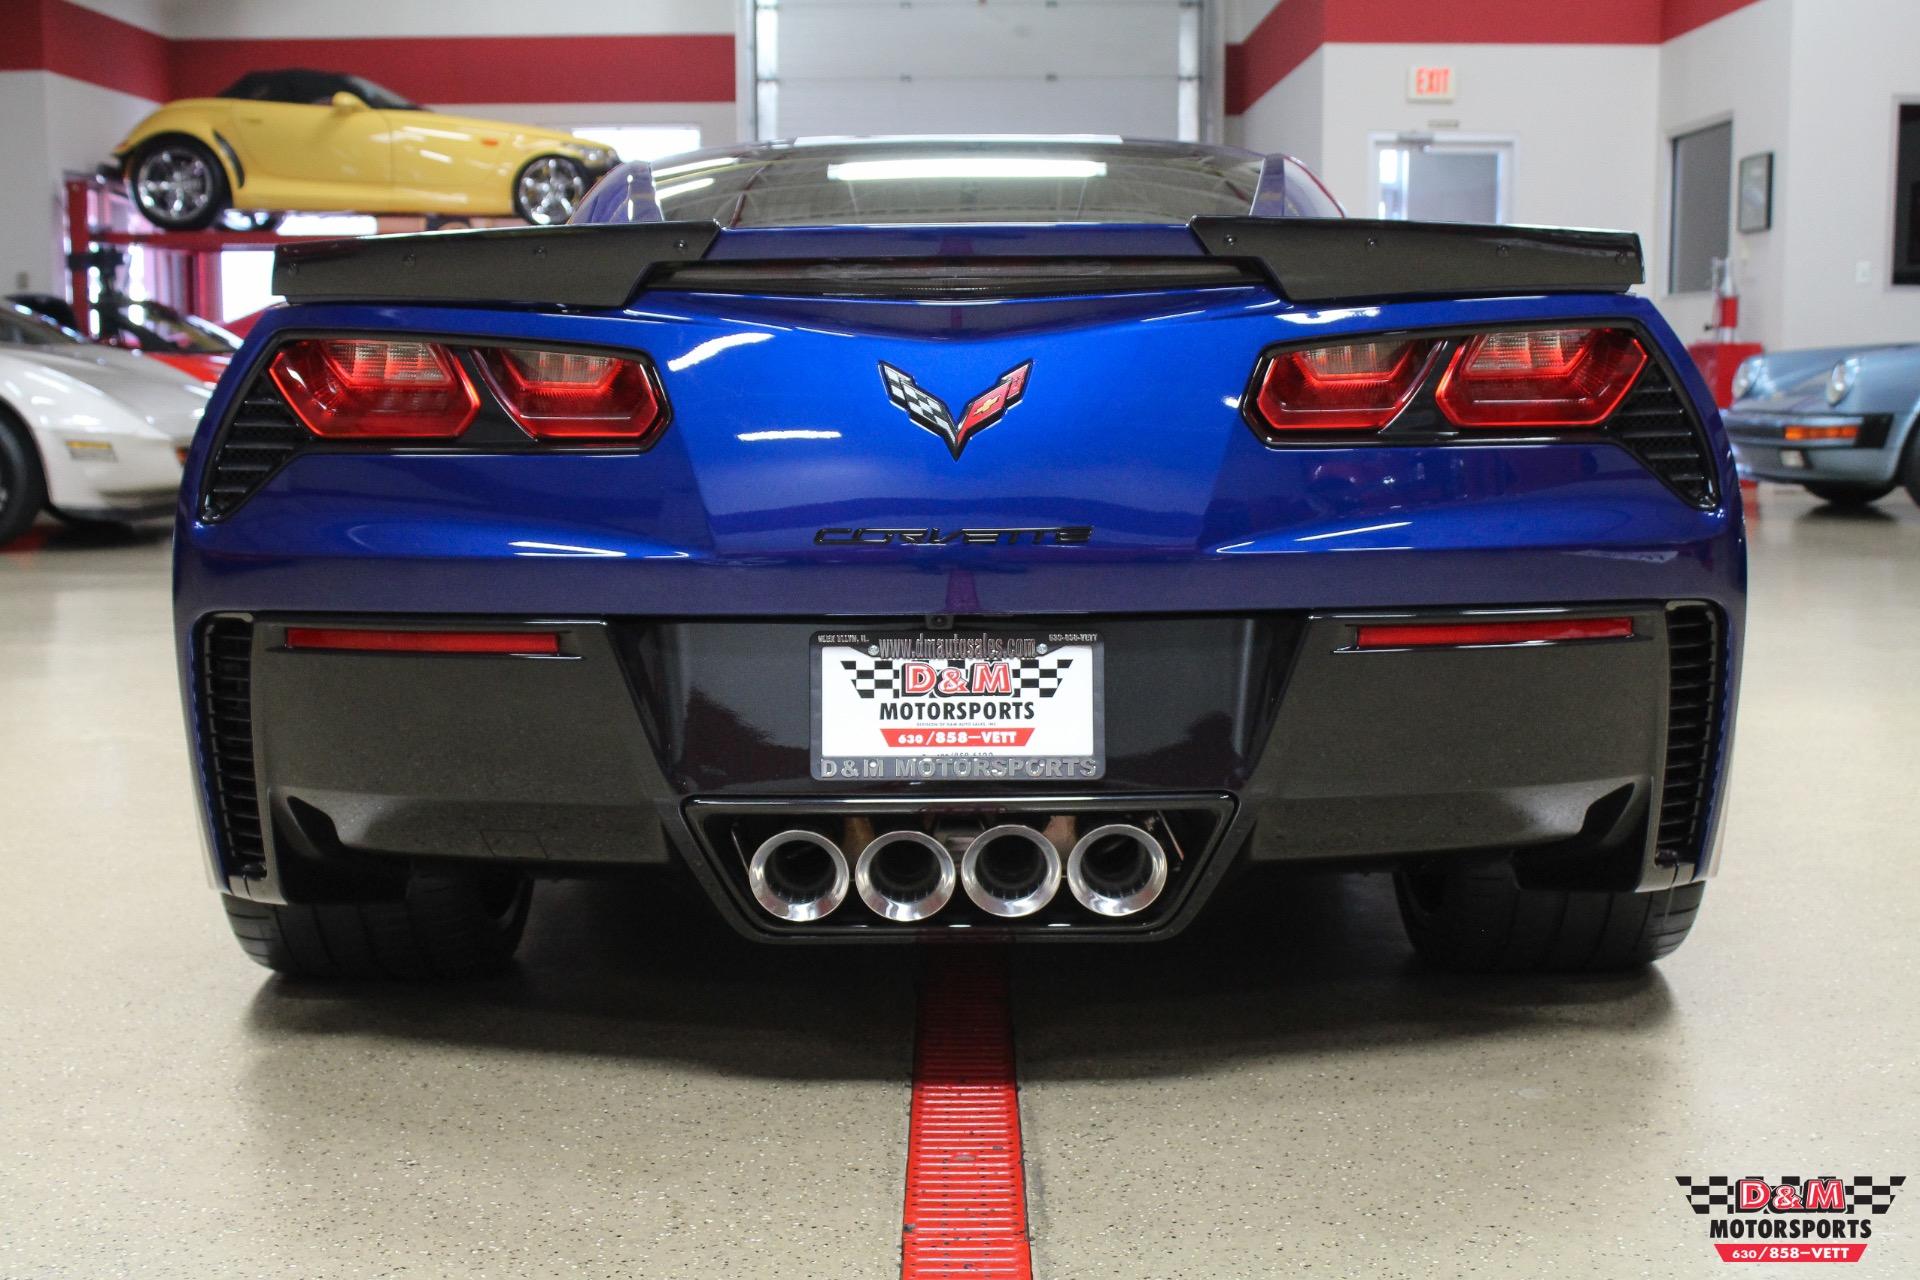 Used 2017 Chevrolet Corvette Stingray Grand Sport Coupe Glen Ellyn Il